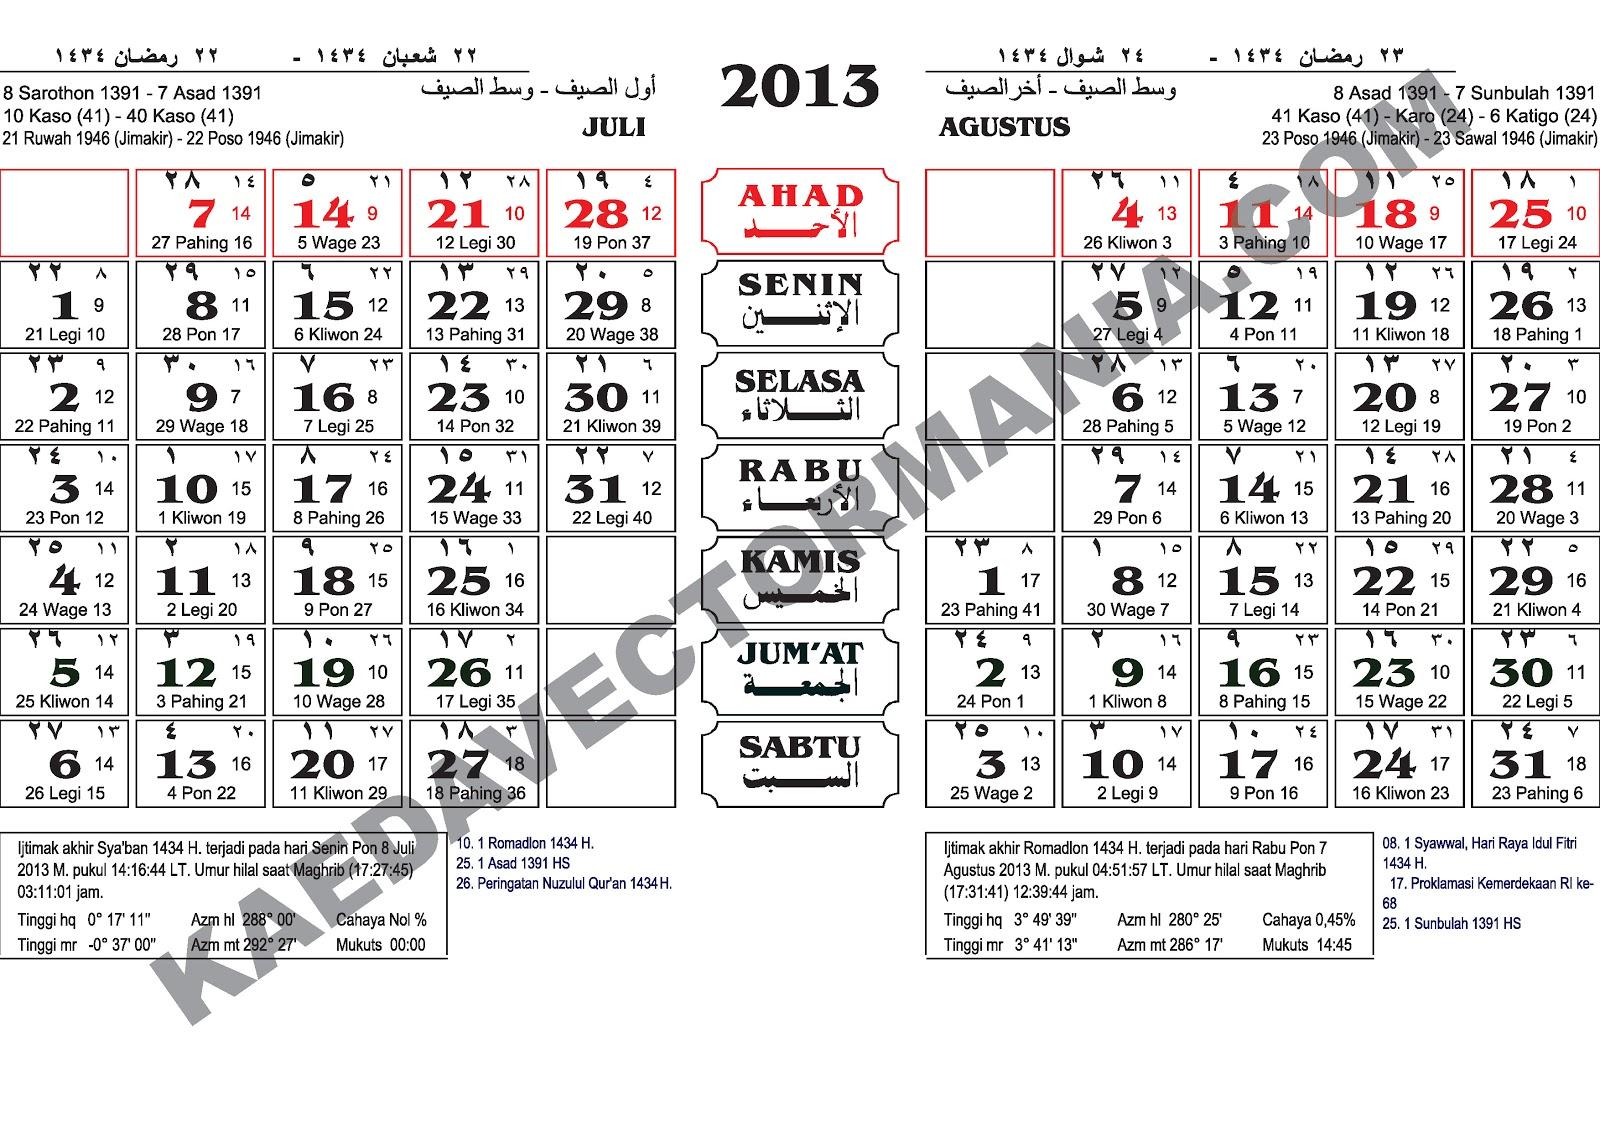 Template kalender 2013 (kalender hijriyah + kalender islam + kalender